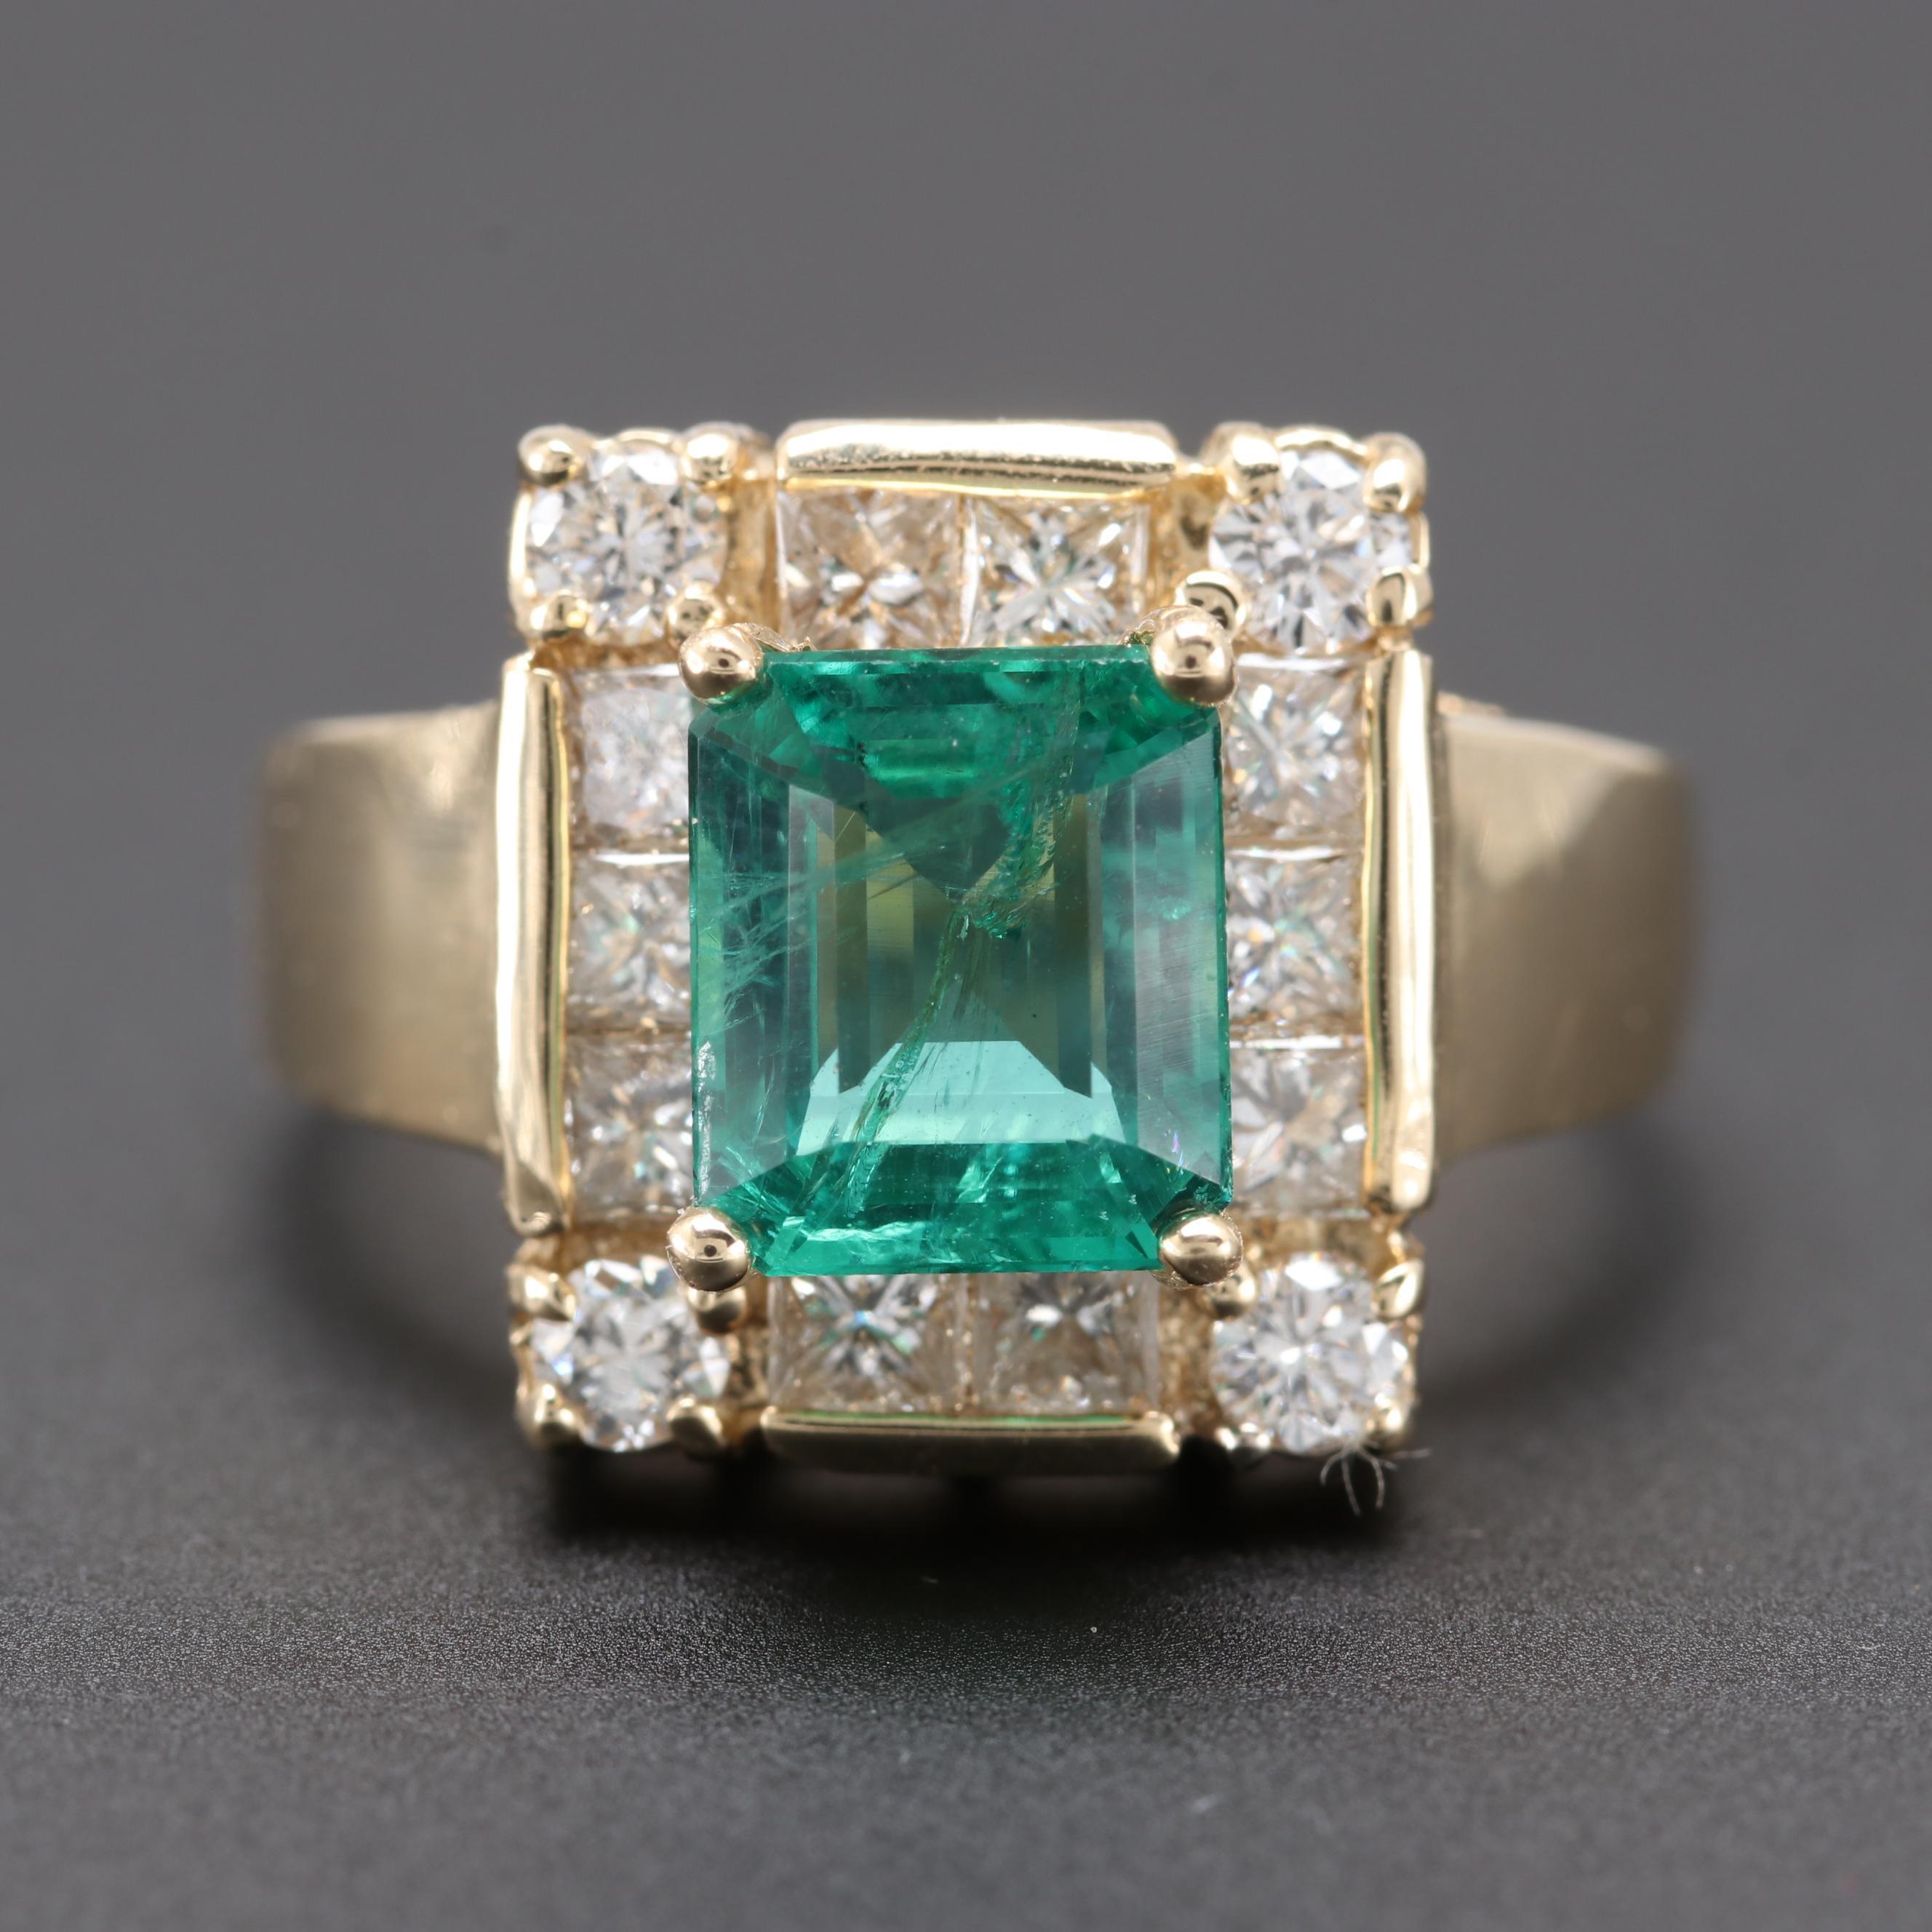 14K Yellow Gold 1.70 CT Emerald and 1.27 CTW Diamond Ring